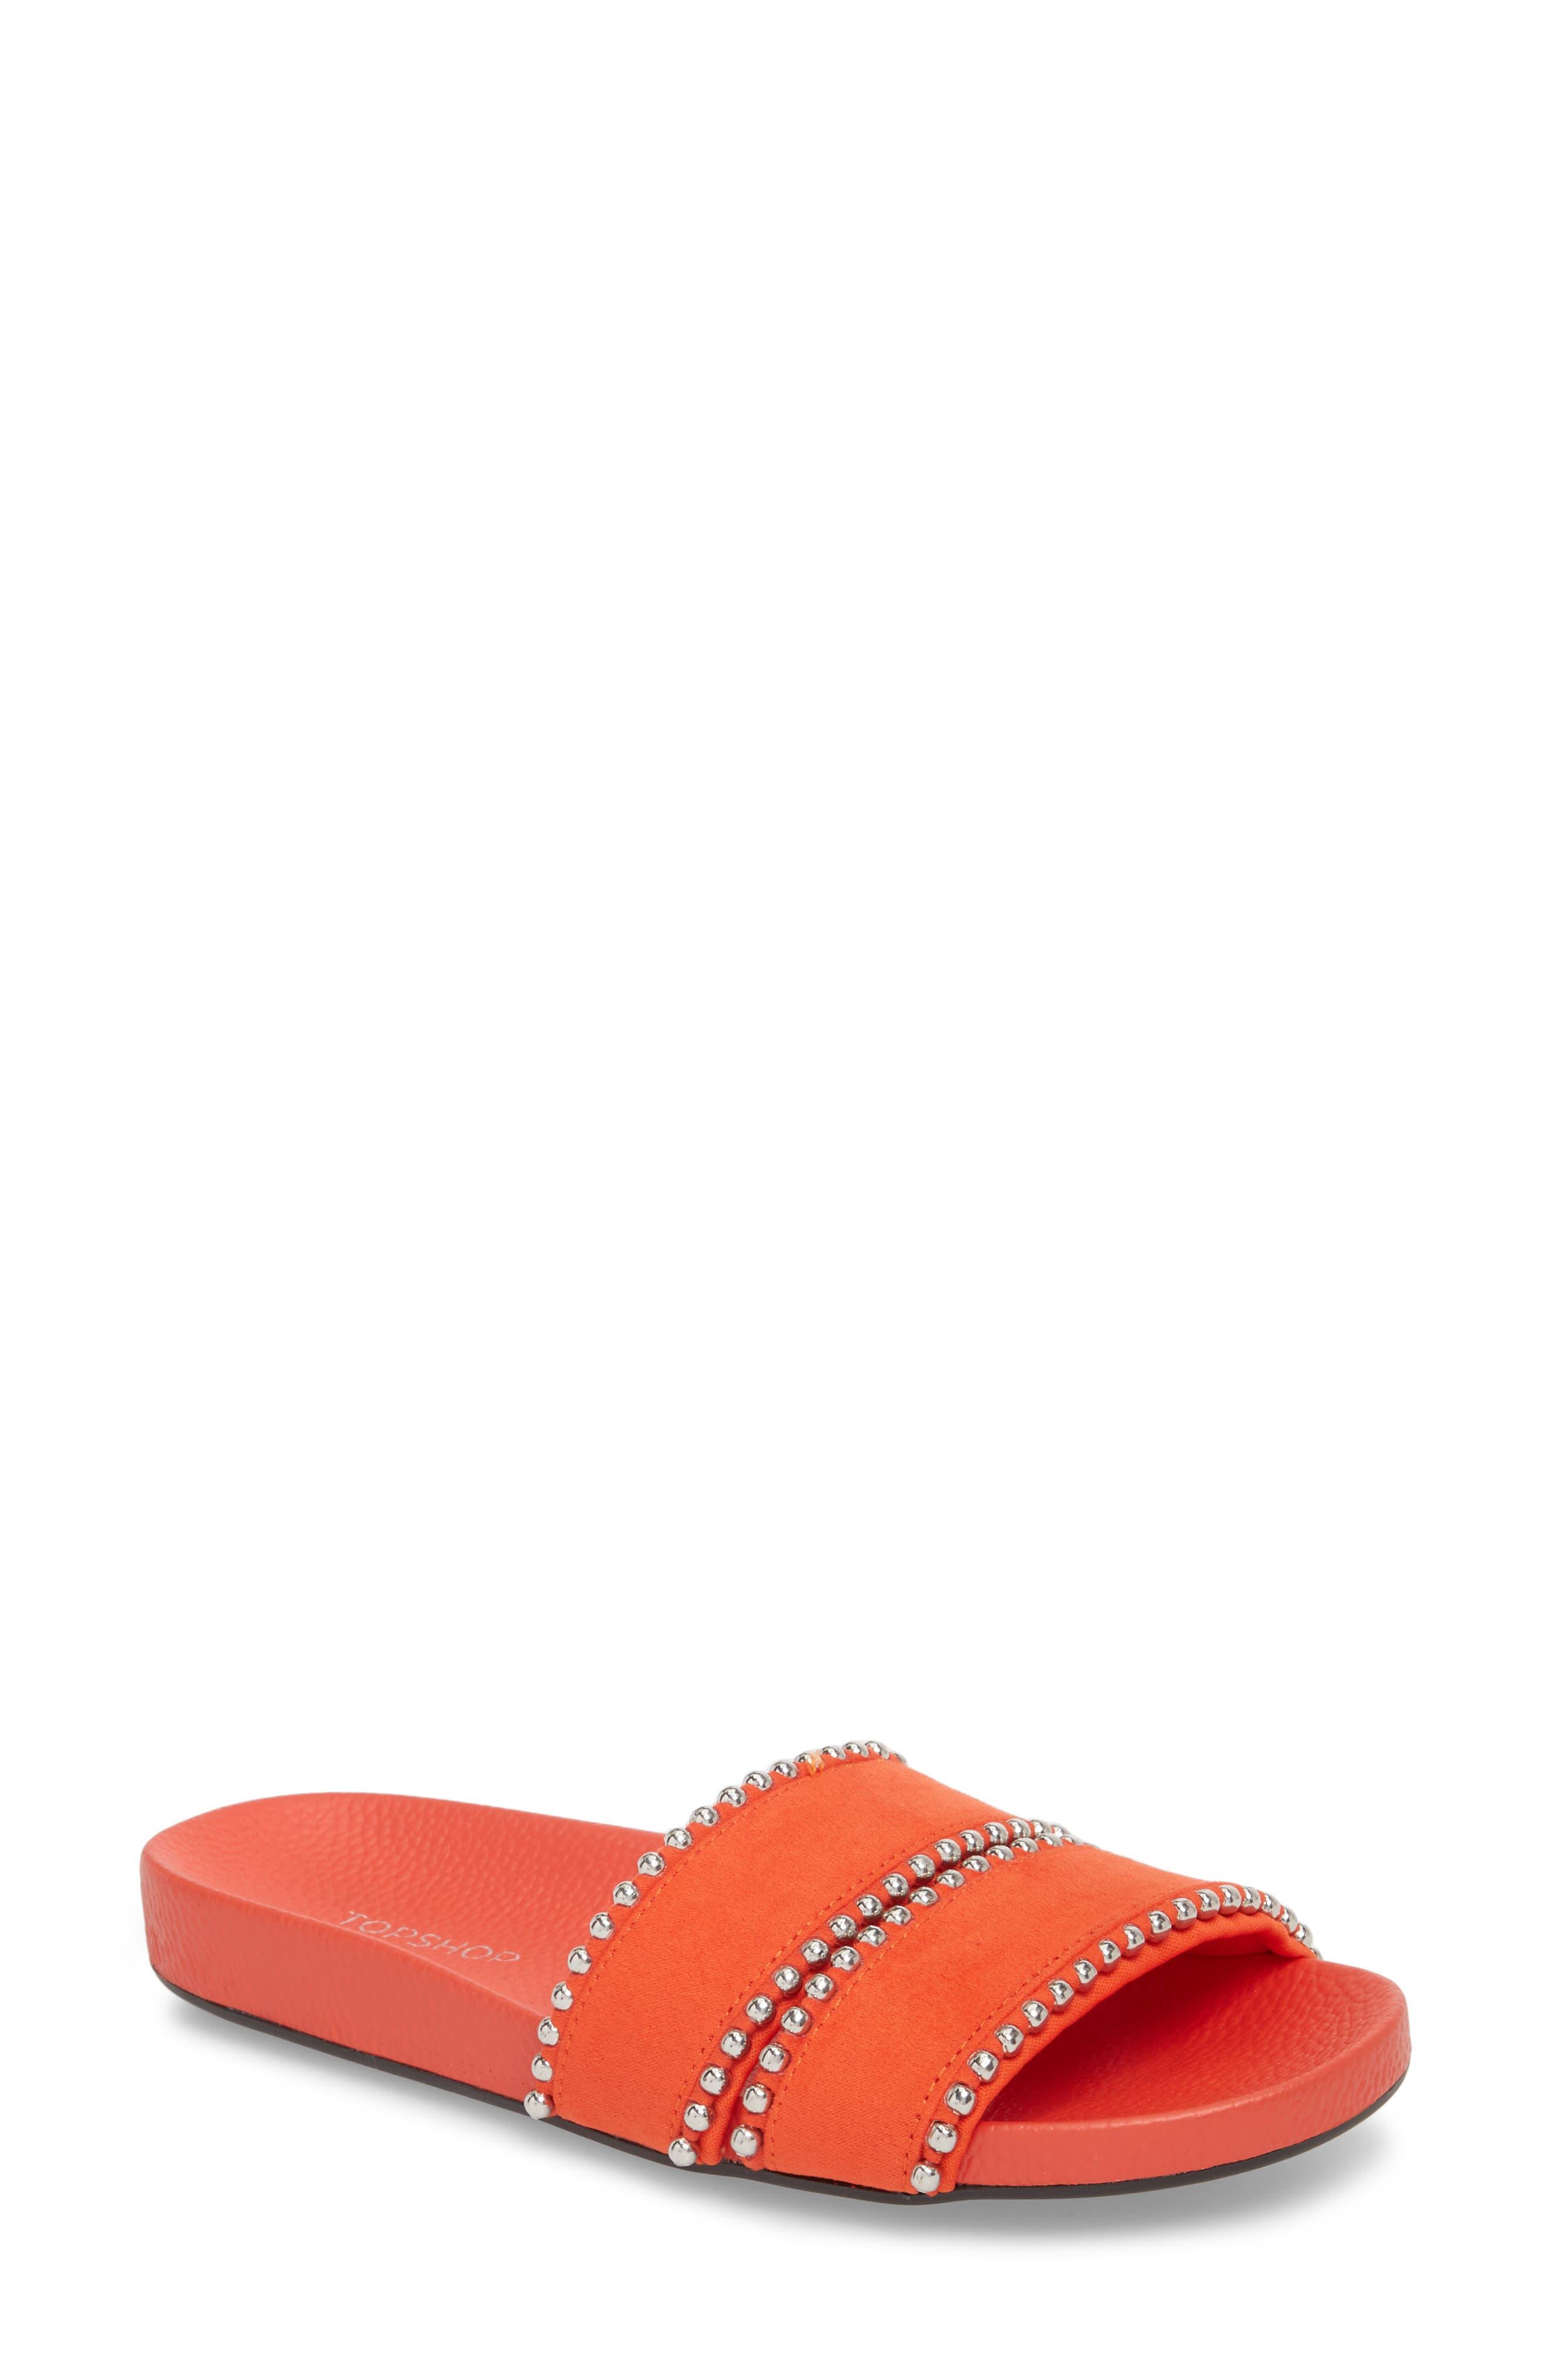 Rascal Studded Slide Sandal,                             Main thumbnail 1, color,                             Red